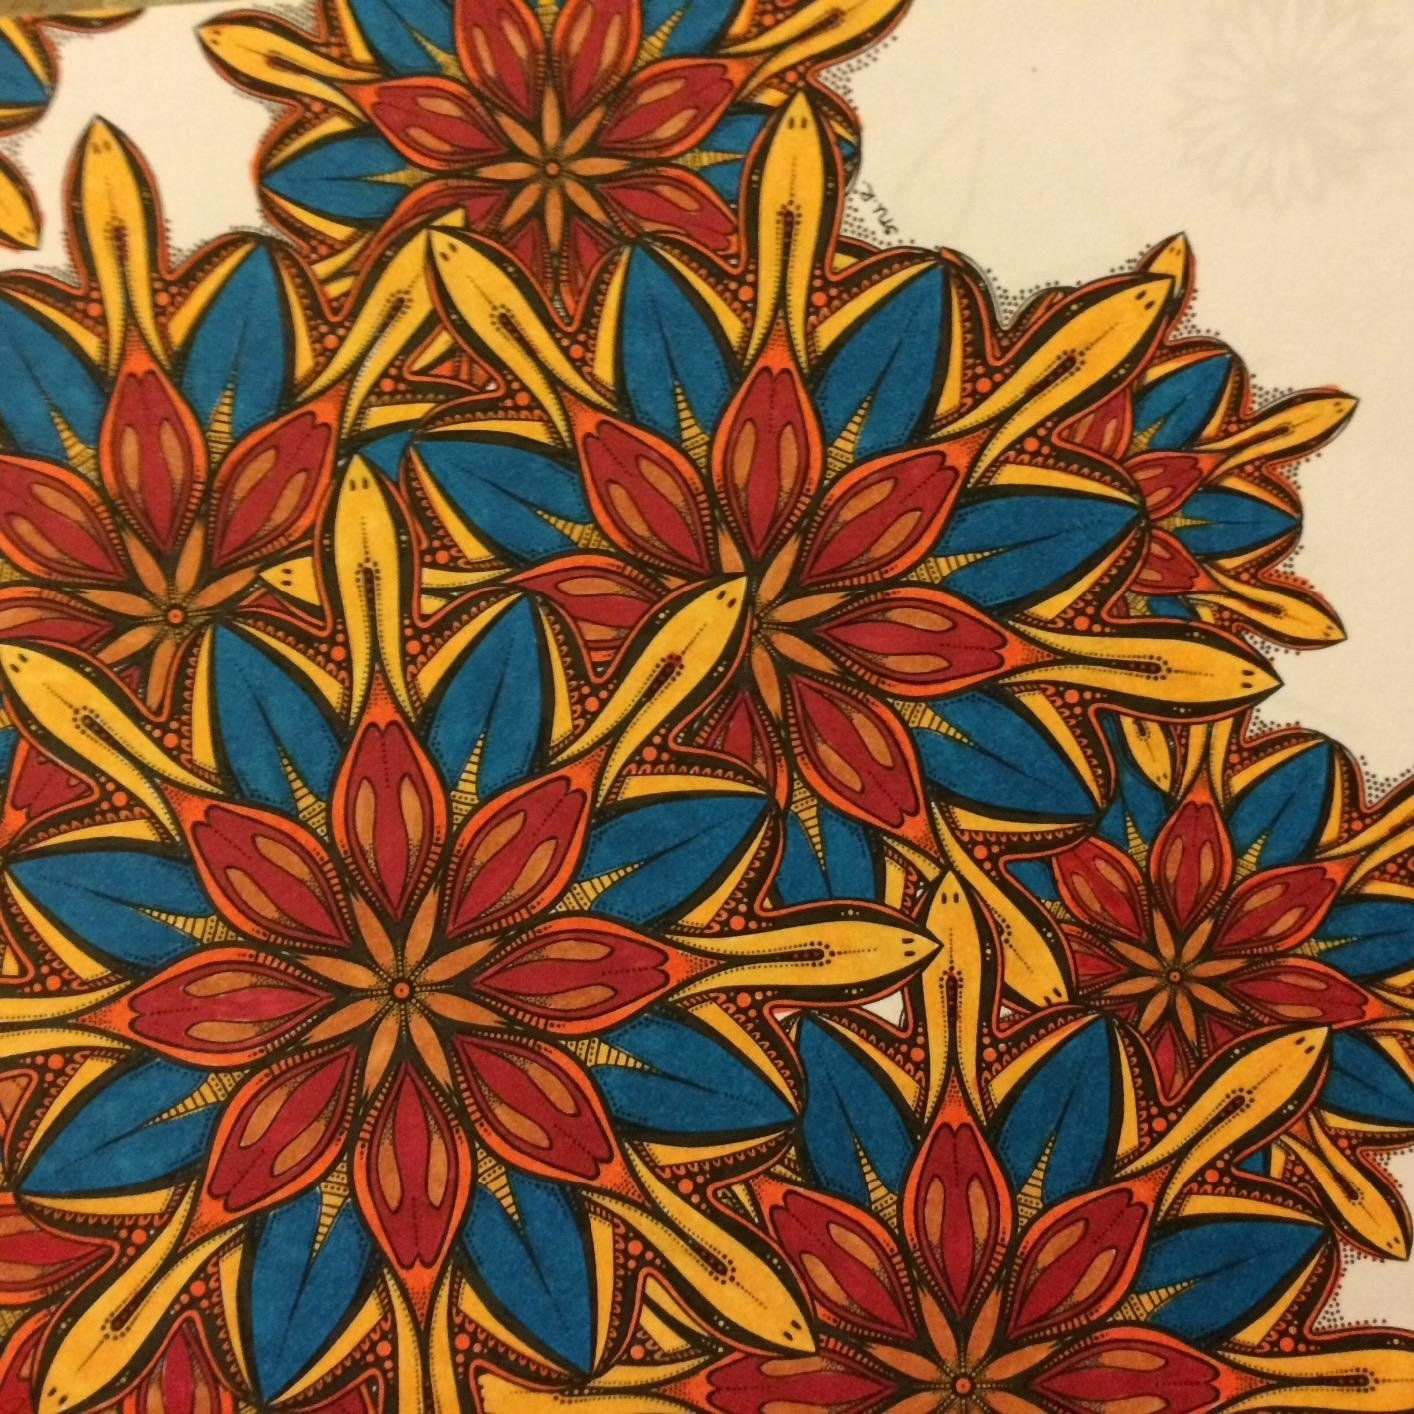 Amazon.com: Circolour: Mandalas & Patterns (Absent-Minded ...